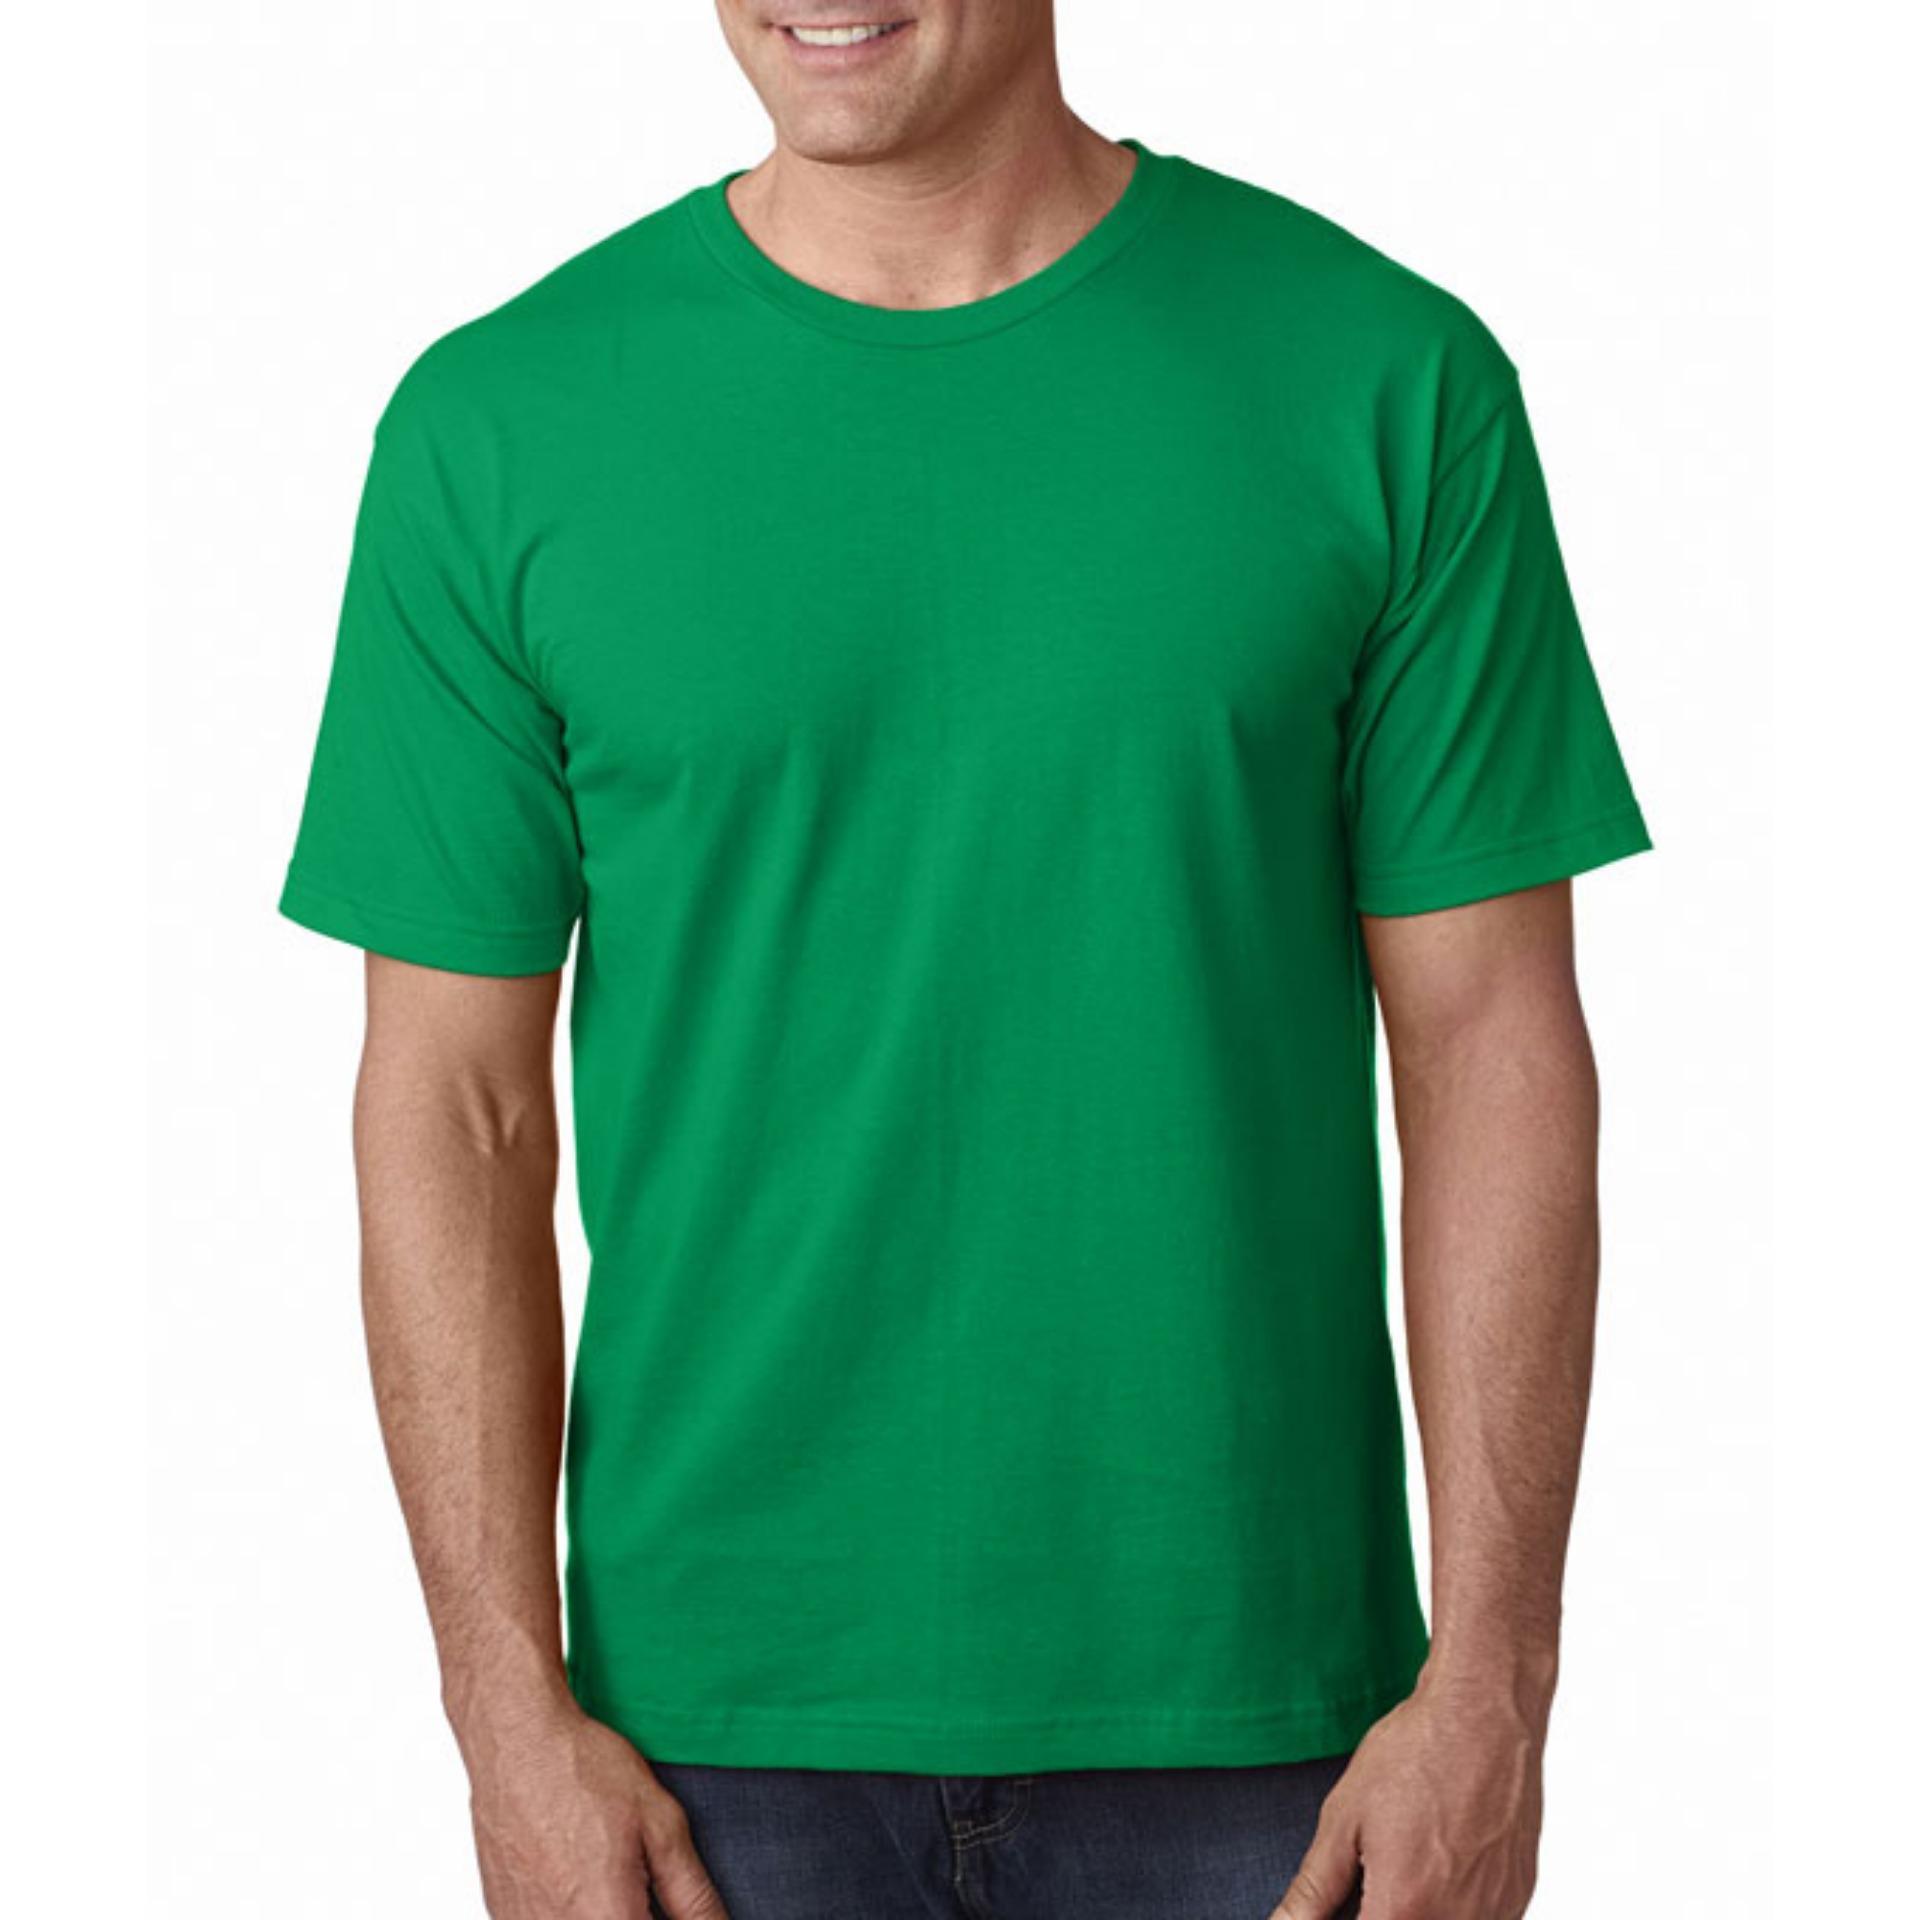 KaosBRO Kaos T-Shirt O-Neck Lengan Pendek - Biru Langit .